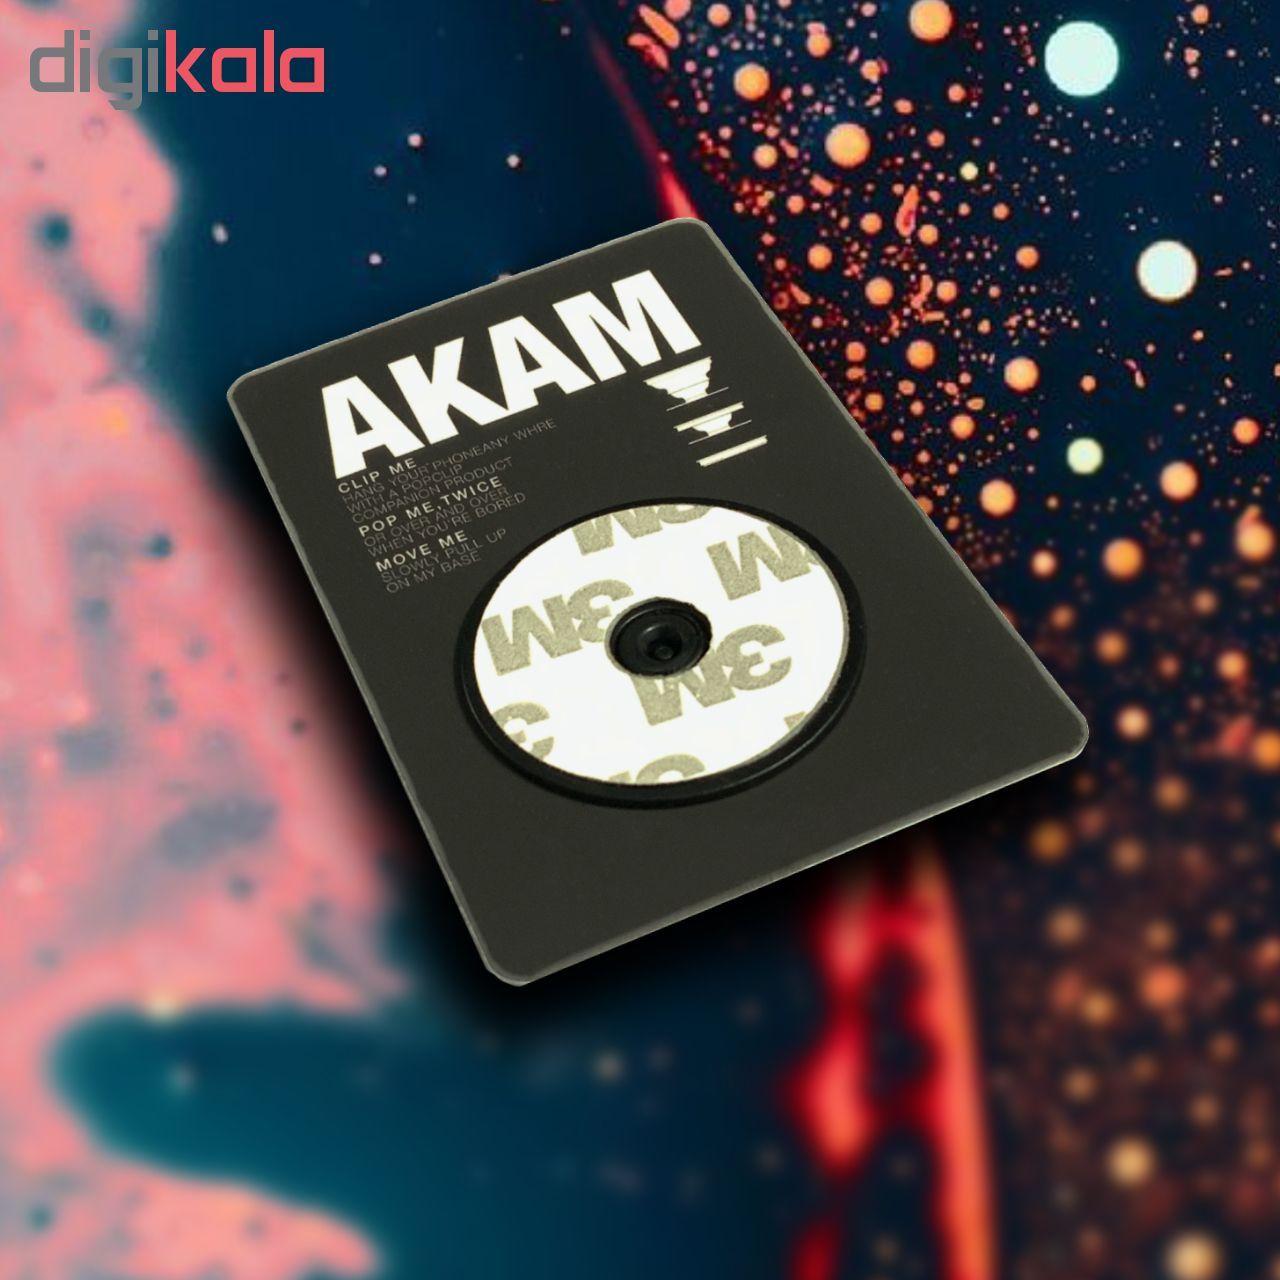 پایه نگهدارنده گوشی موبایل پاپ سوکت آکام مدل APS0286 main 1 3